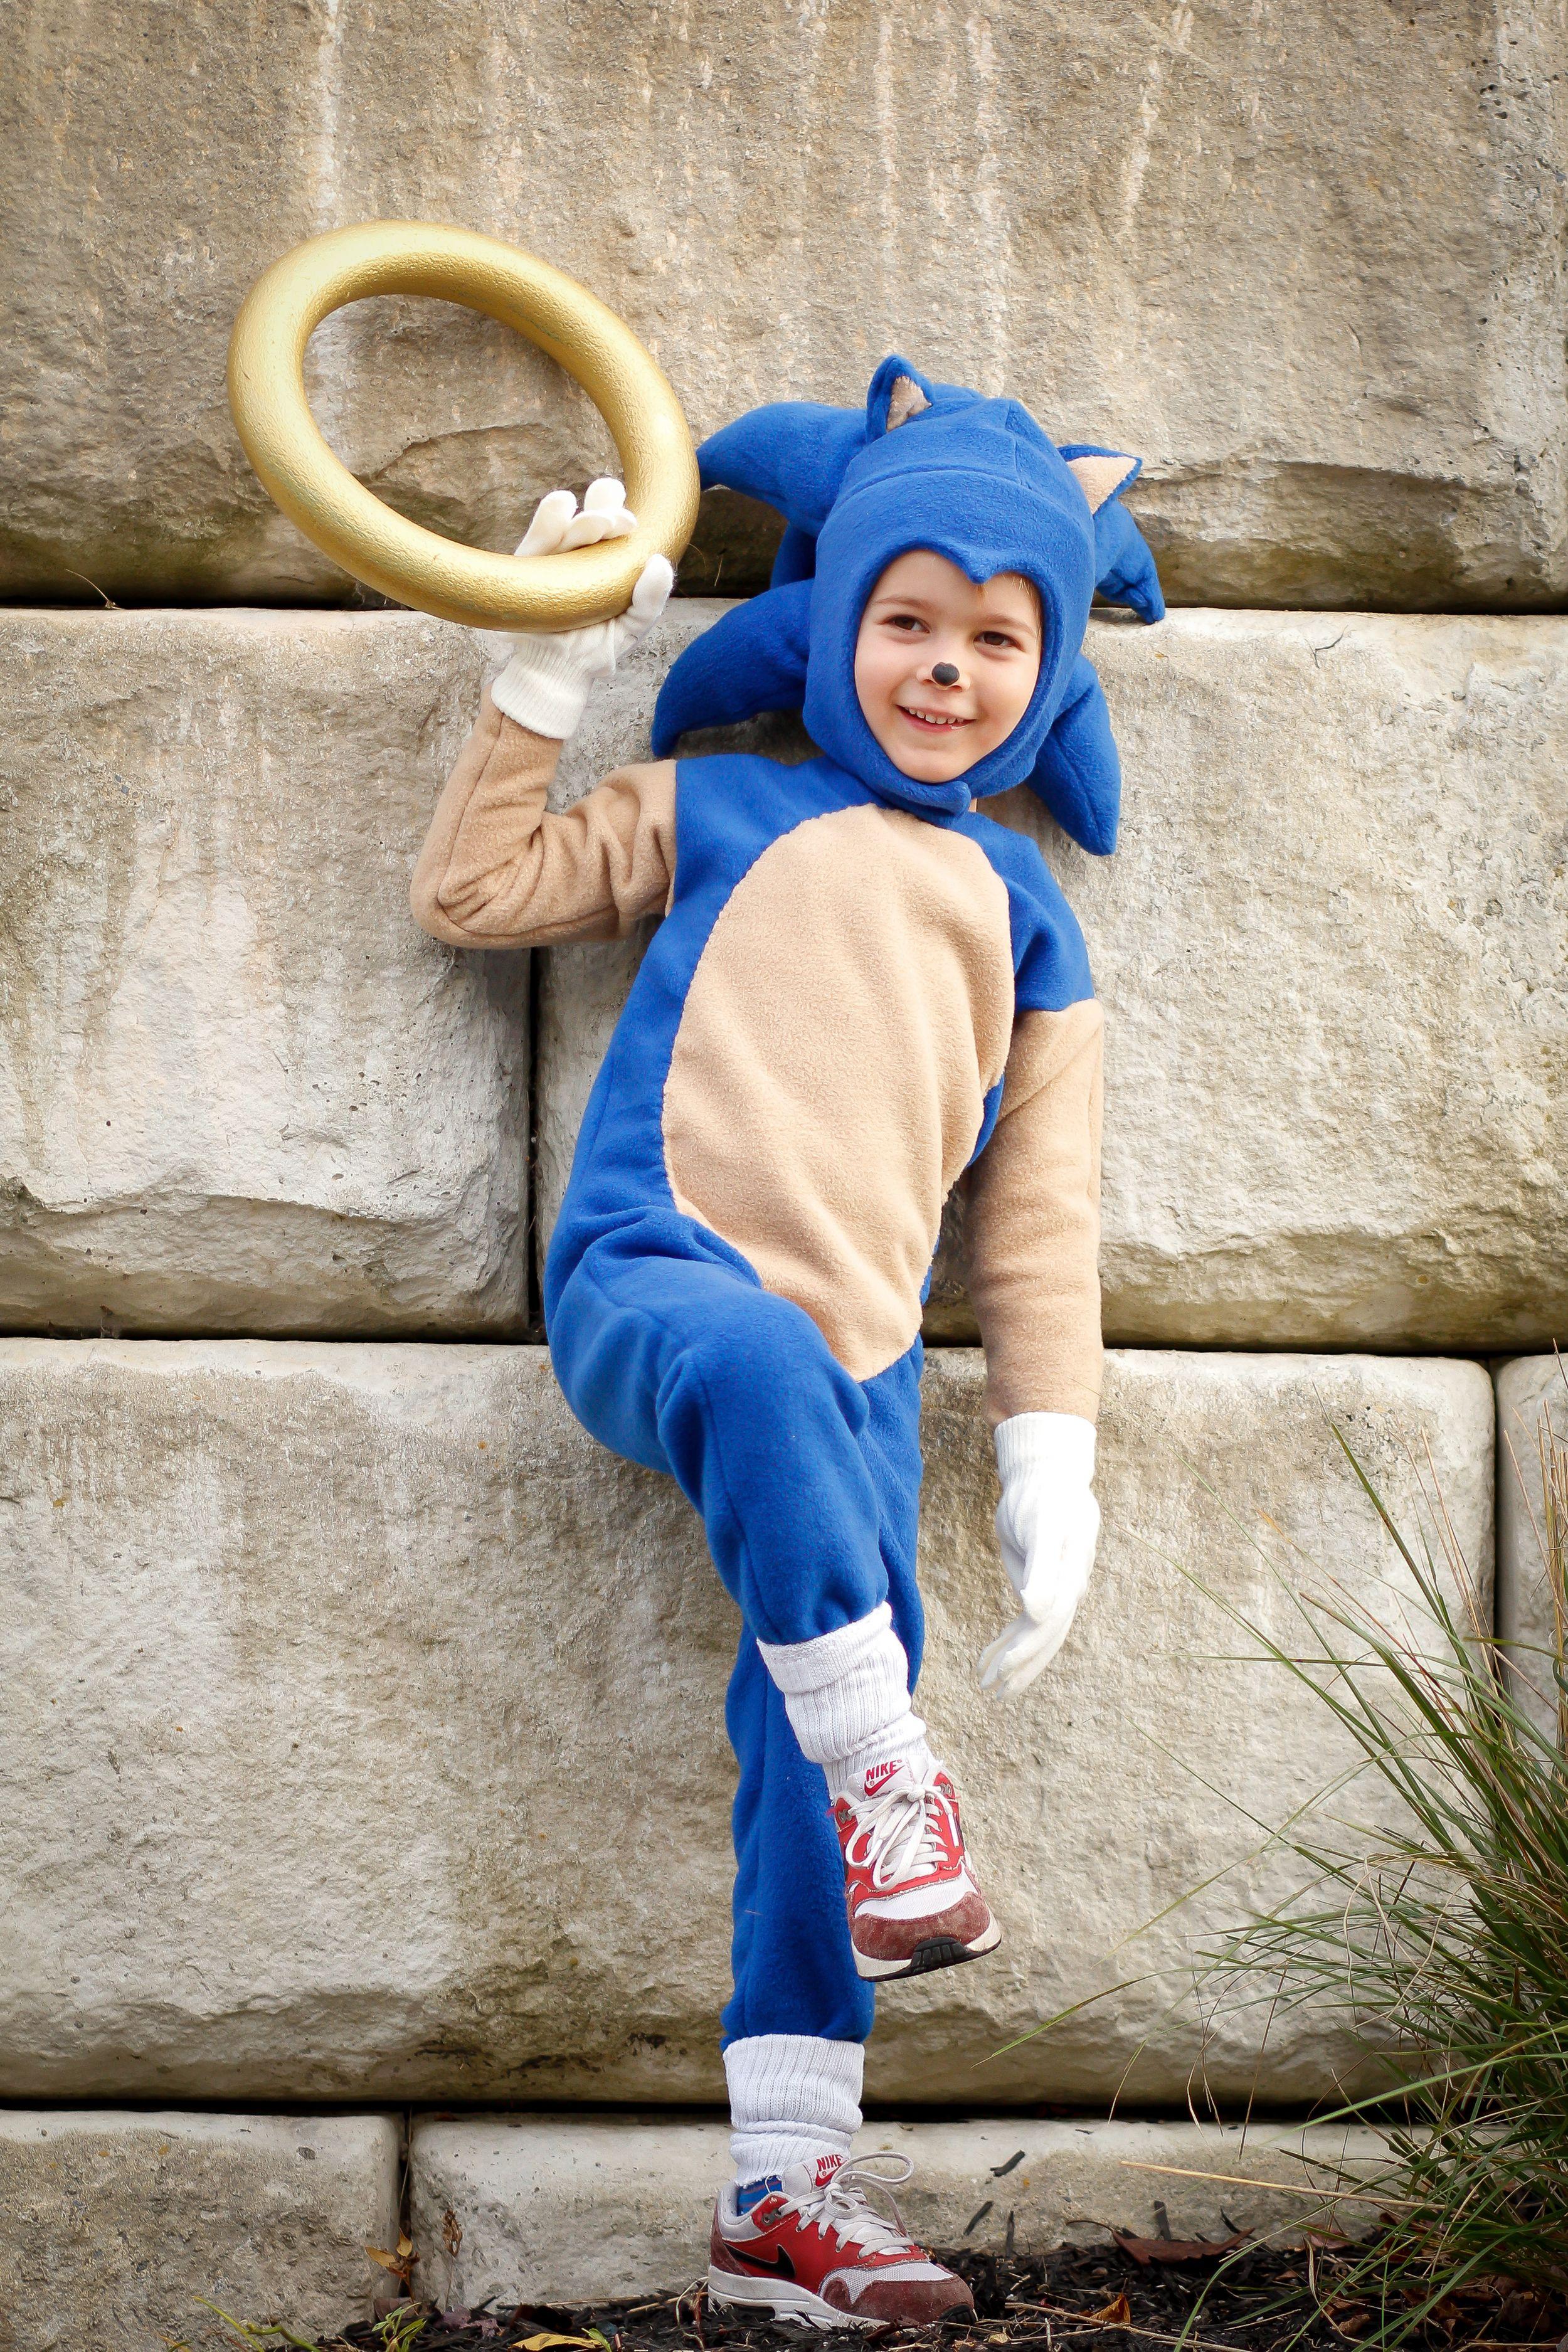 Handmade Sonic The Hedgehog Halloween Costume Diy Halloween Costume Tutorial Sonic The Hedgehog Halloween Costume Sonic The Hedgehog Costume Sonic Costume